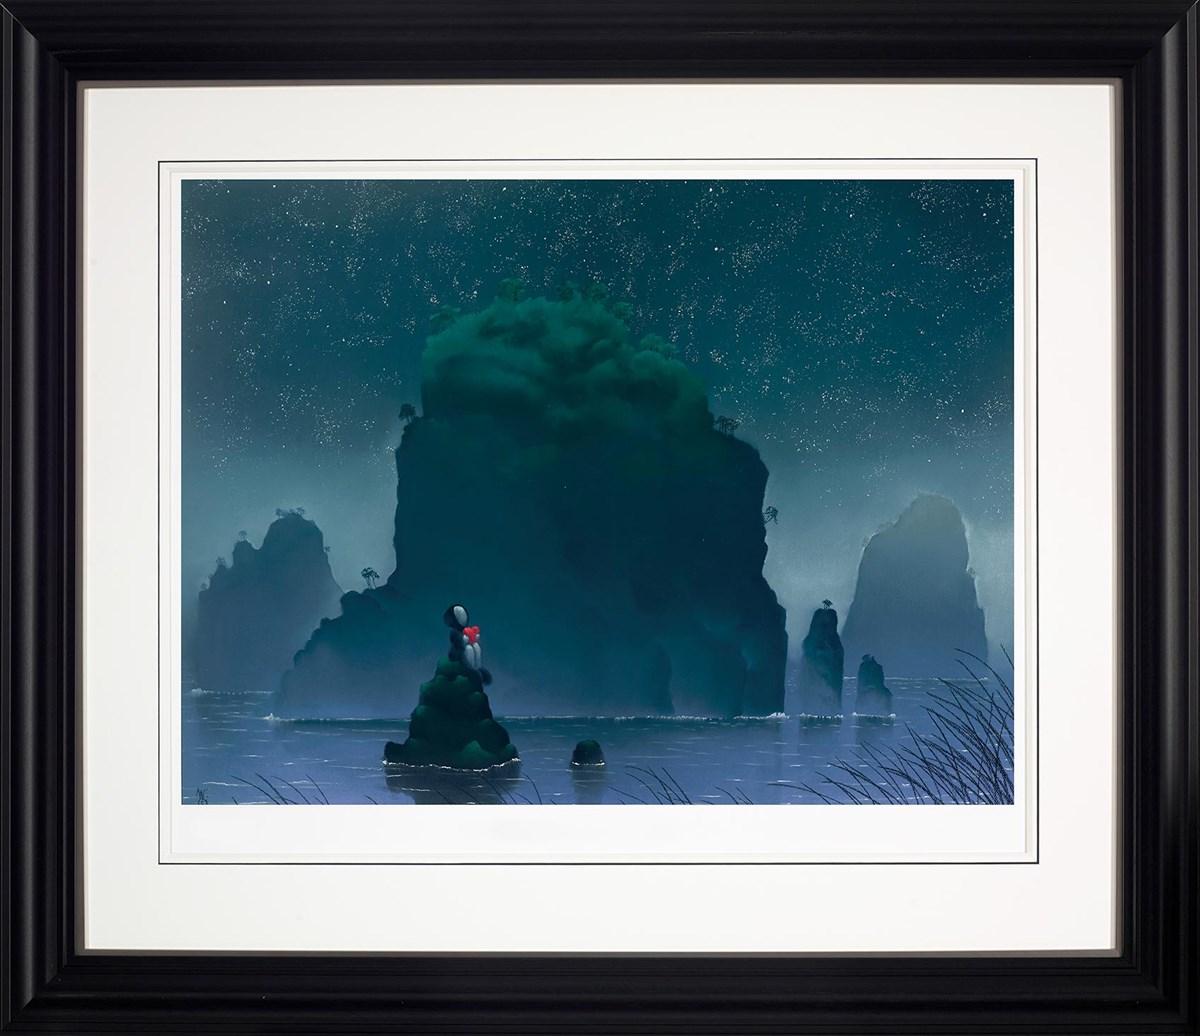 Youre My Rock - Framed by Mackenzie Thorpe